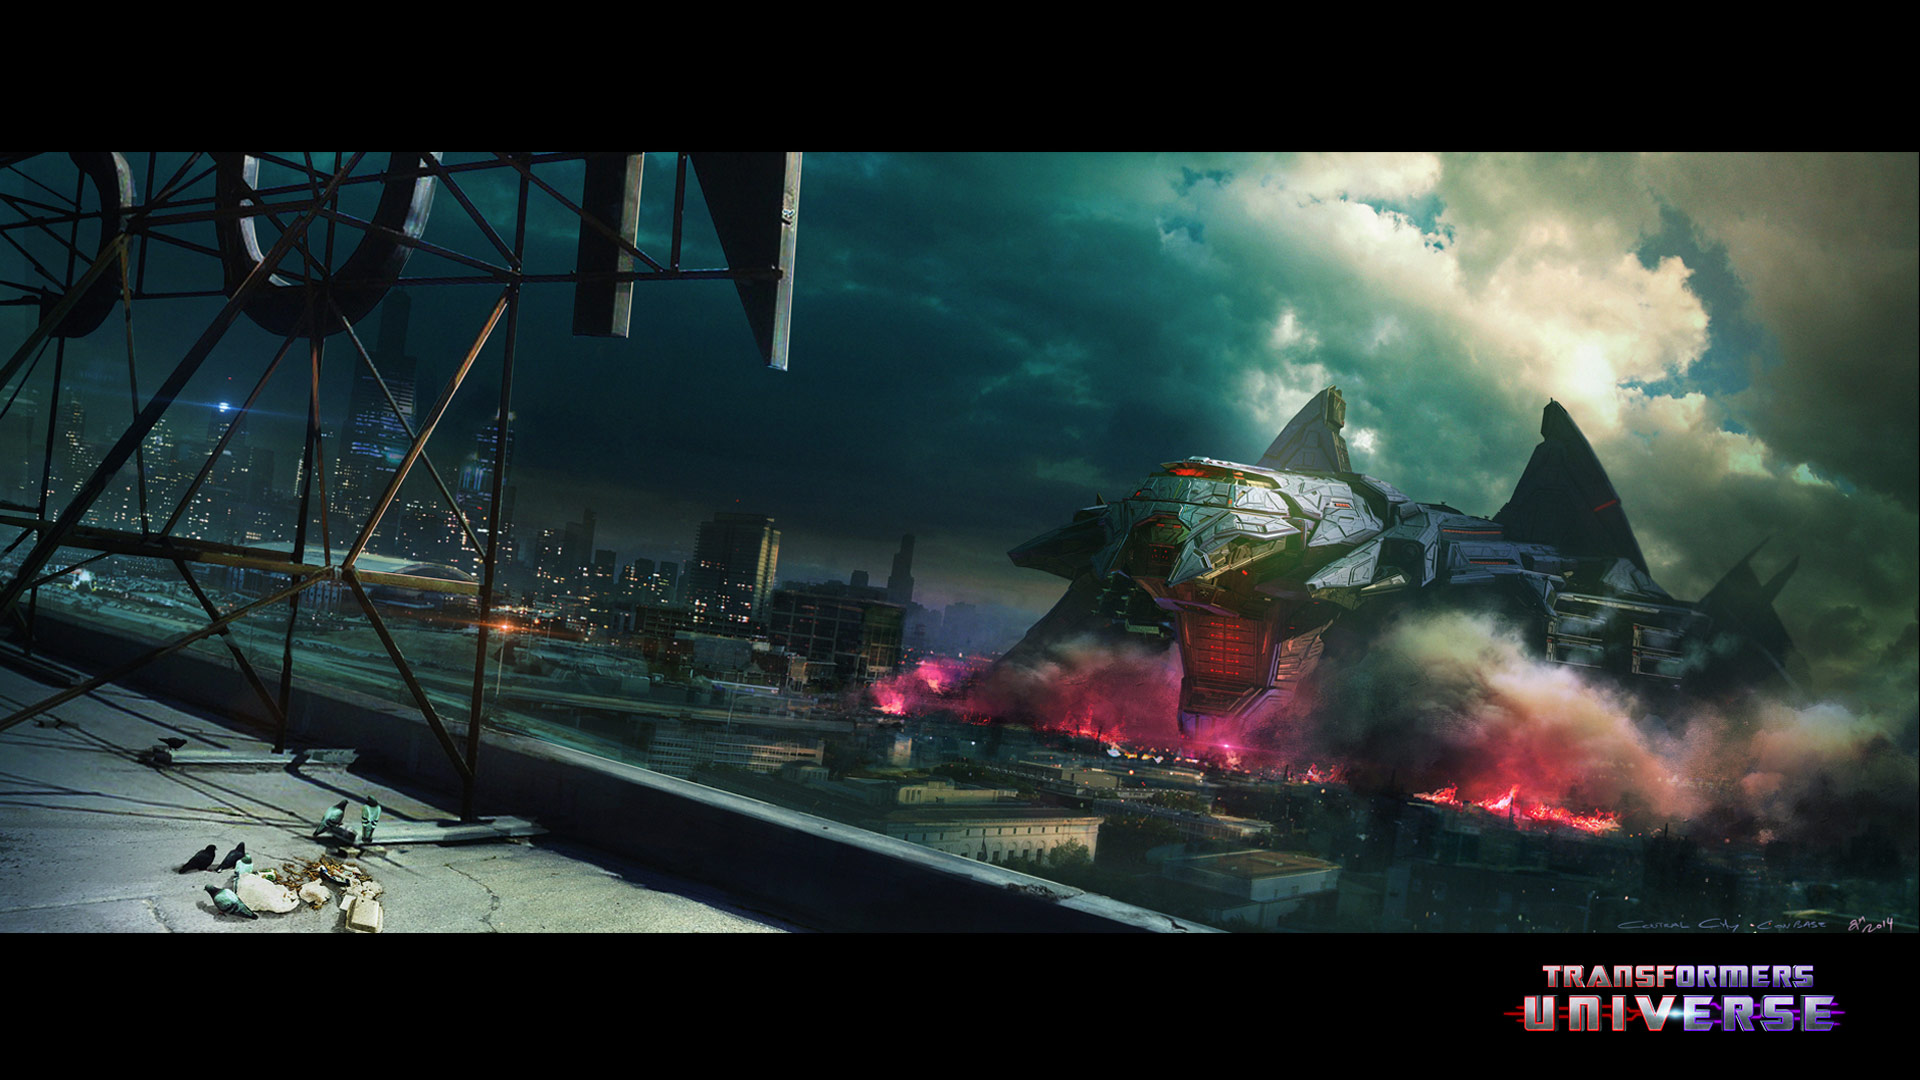 Leviathan (starship)